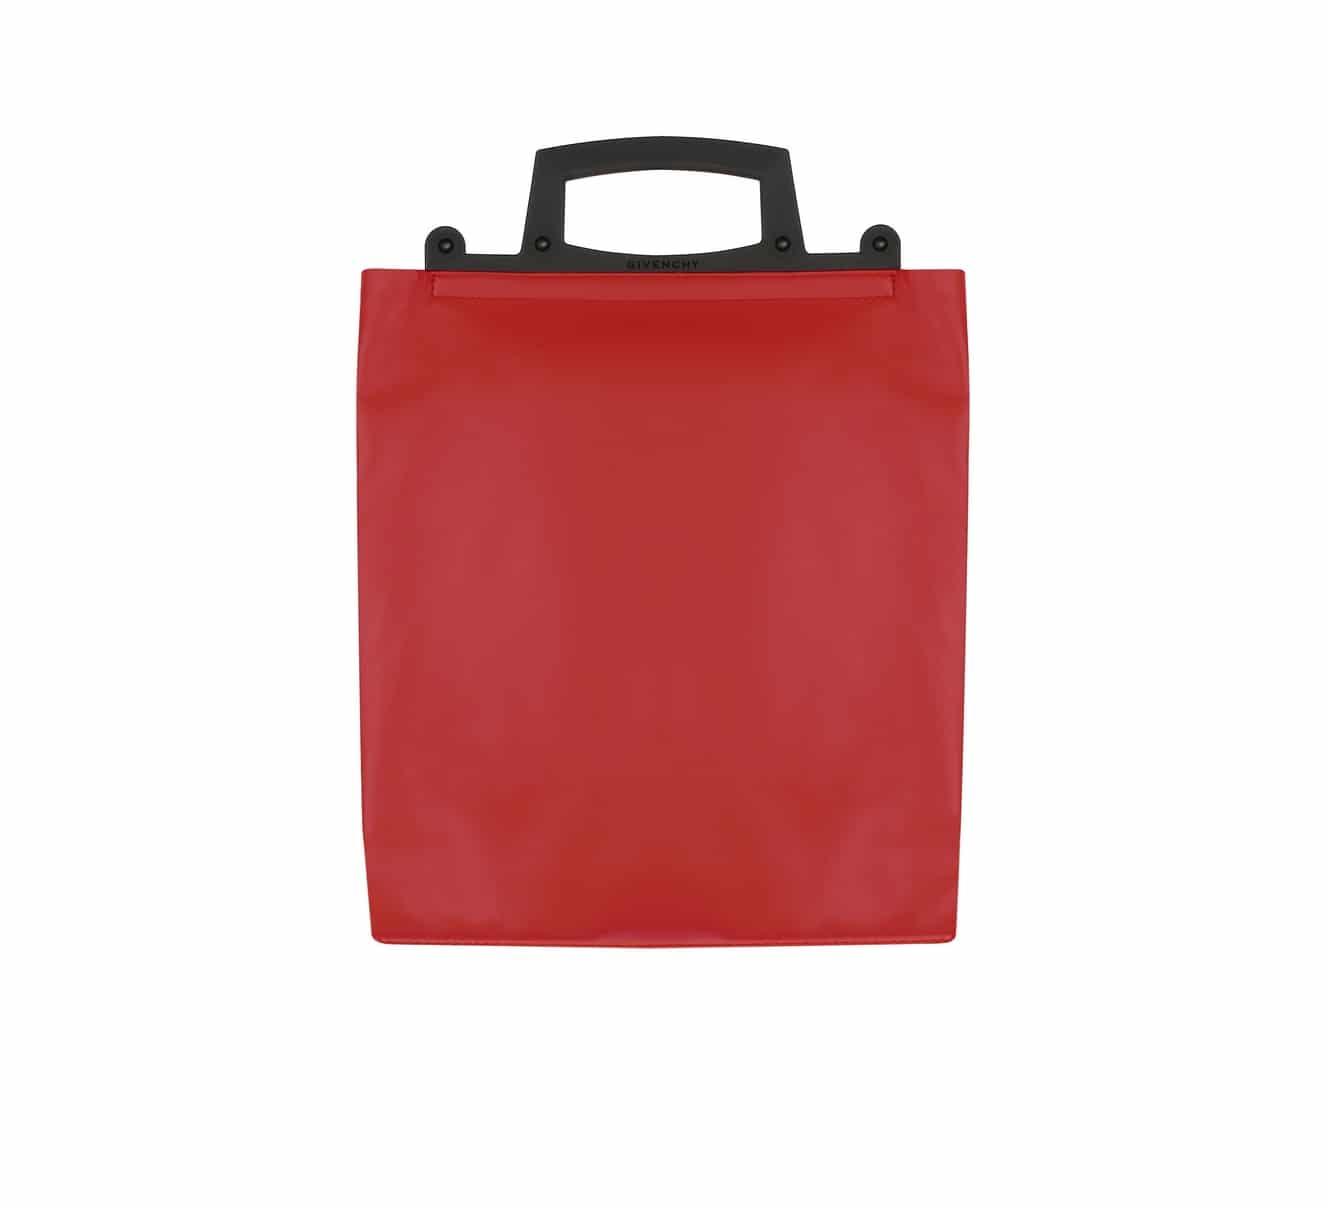 fec1685a7d Givenchy Pre-Fall 2014 Bag Collection features new Pandora Flap Bag ...